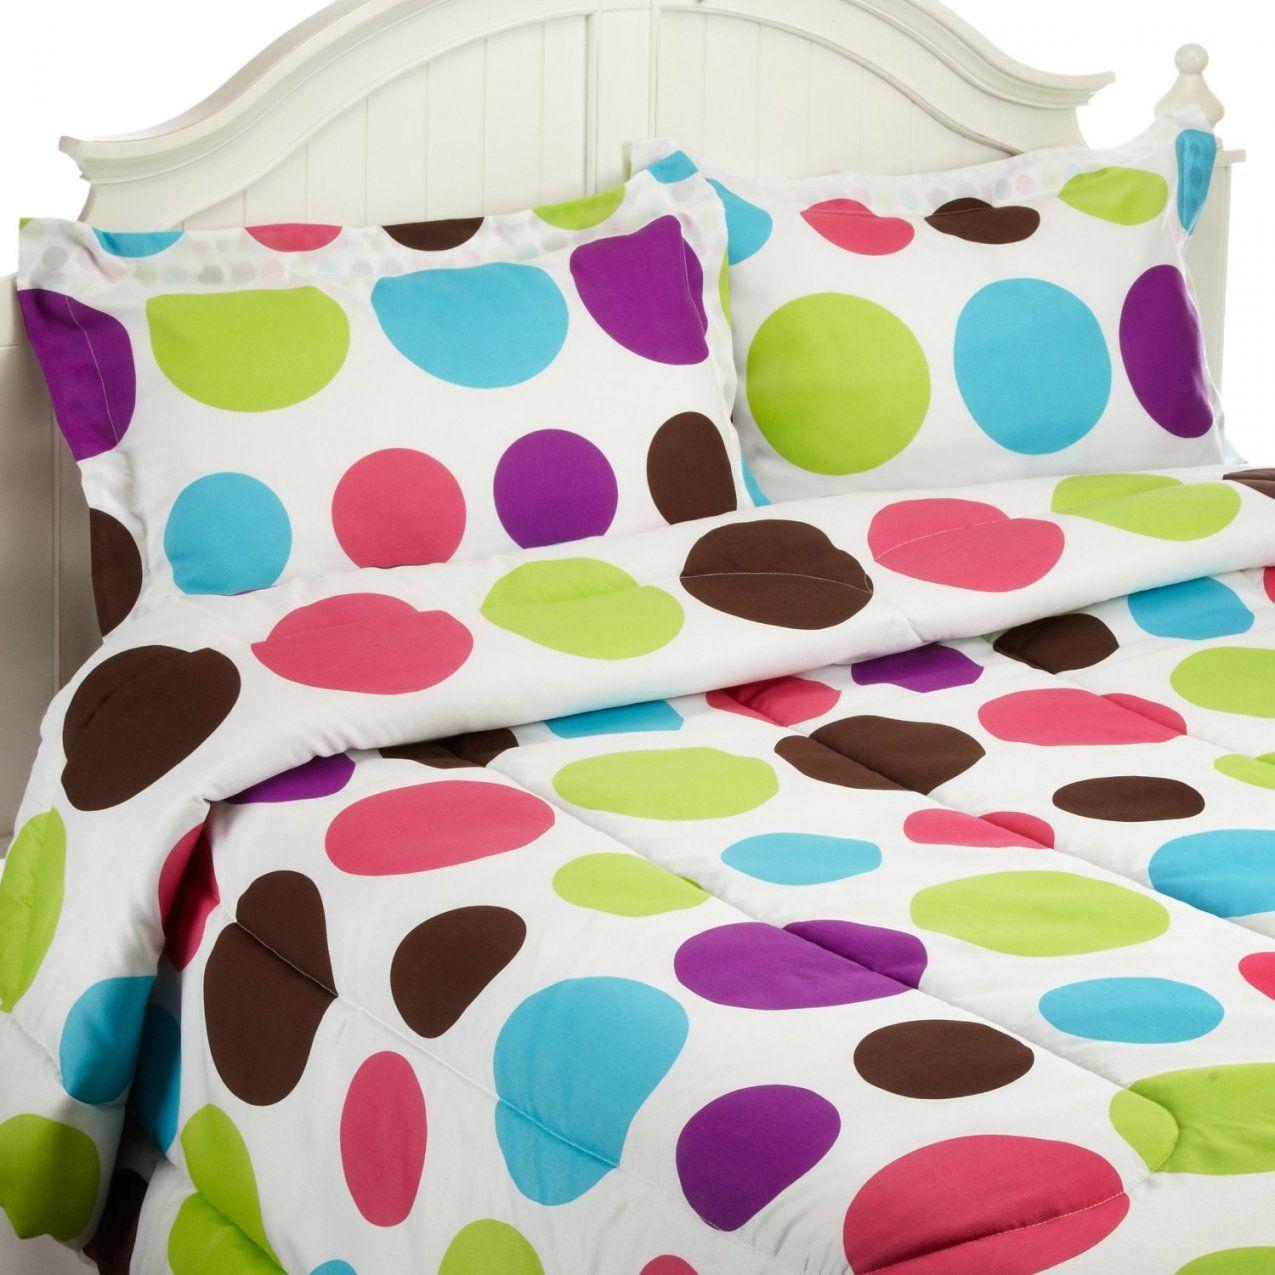 Cute Polka Dots Comforter Sets von Polka Dotted Bed Sheets Photo